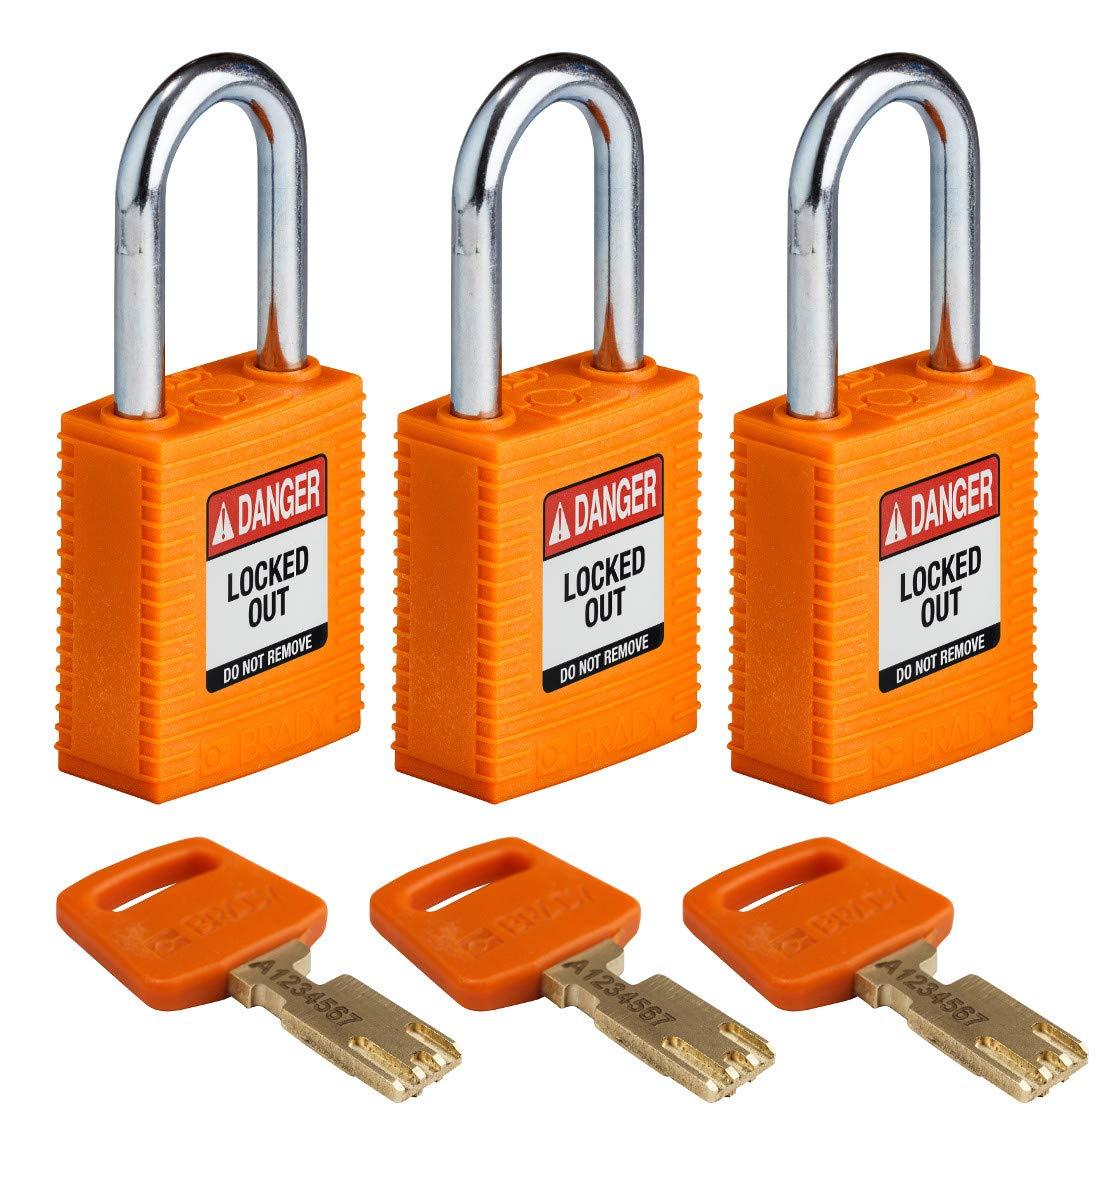 Brady SafeKey Lockout Padlock - Nylon - Orange - 1.5'' Steel Shackle Vertical Clearance - Keyed Alike (Pack of 3)